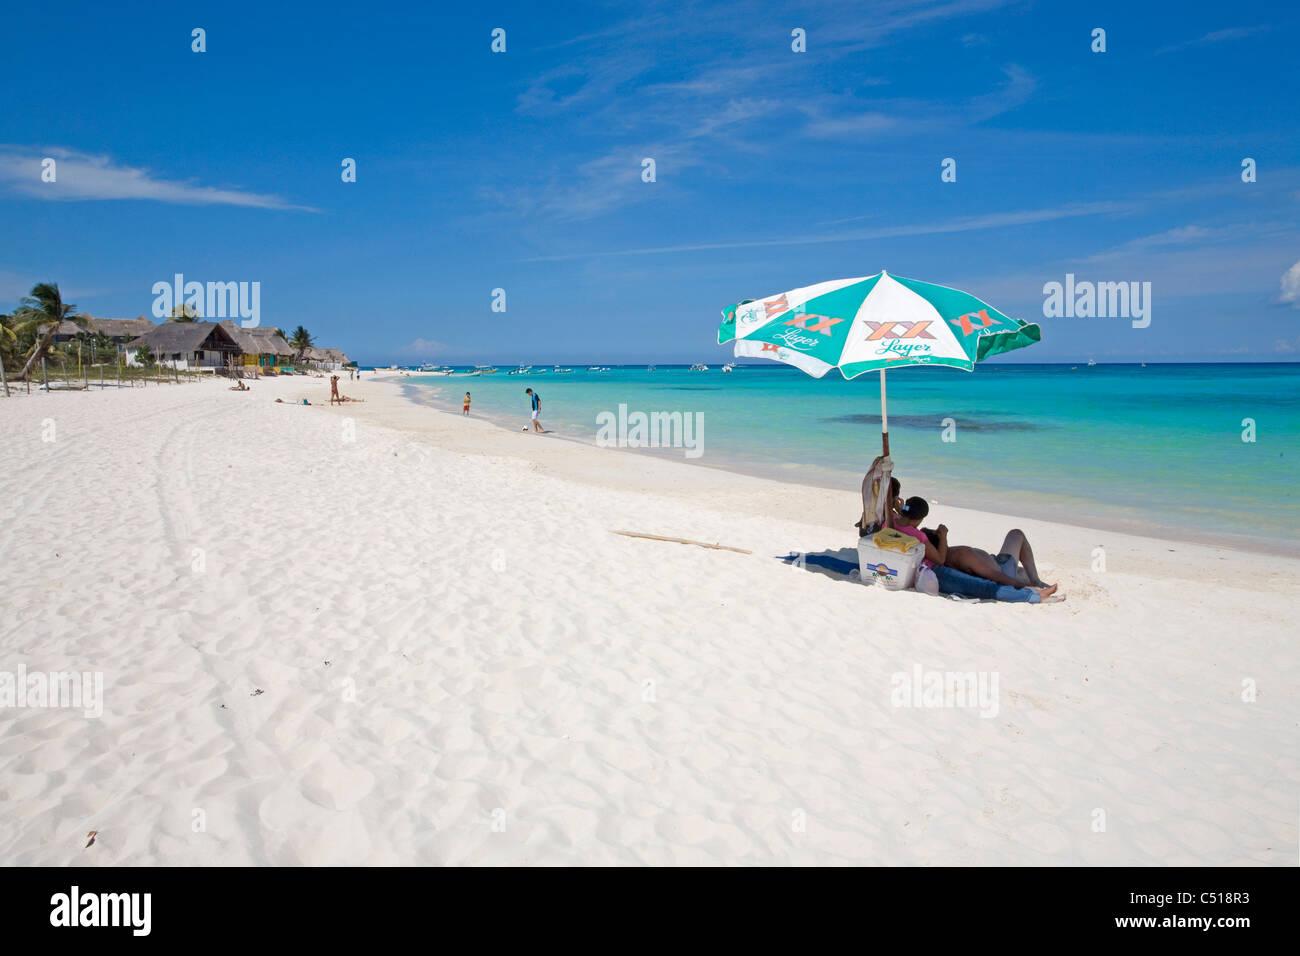 Menschen bin Strand von Playa del Carmen, Yukatan, Mexiko, Menschen am sandigen Strand, Playa del Carmen, Yucatan, Stockbild